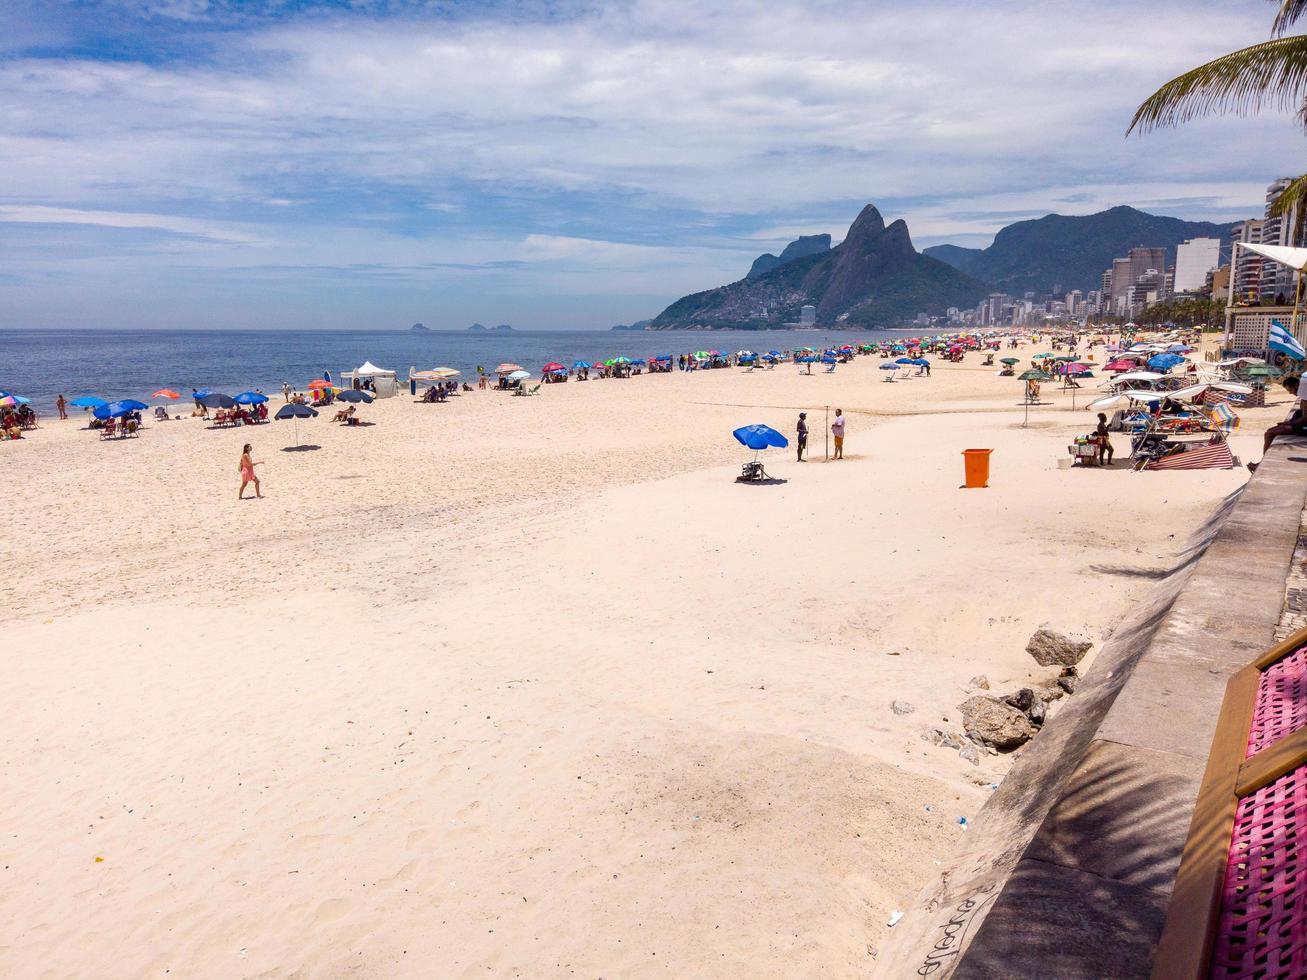 rio de janeiro, brazilië, 2015 - het strand van ipanema overdag foto